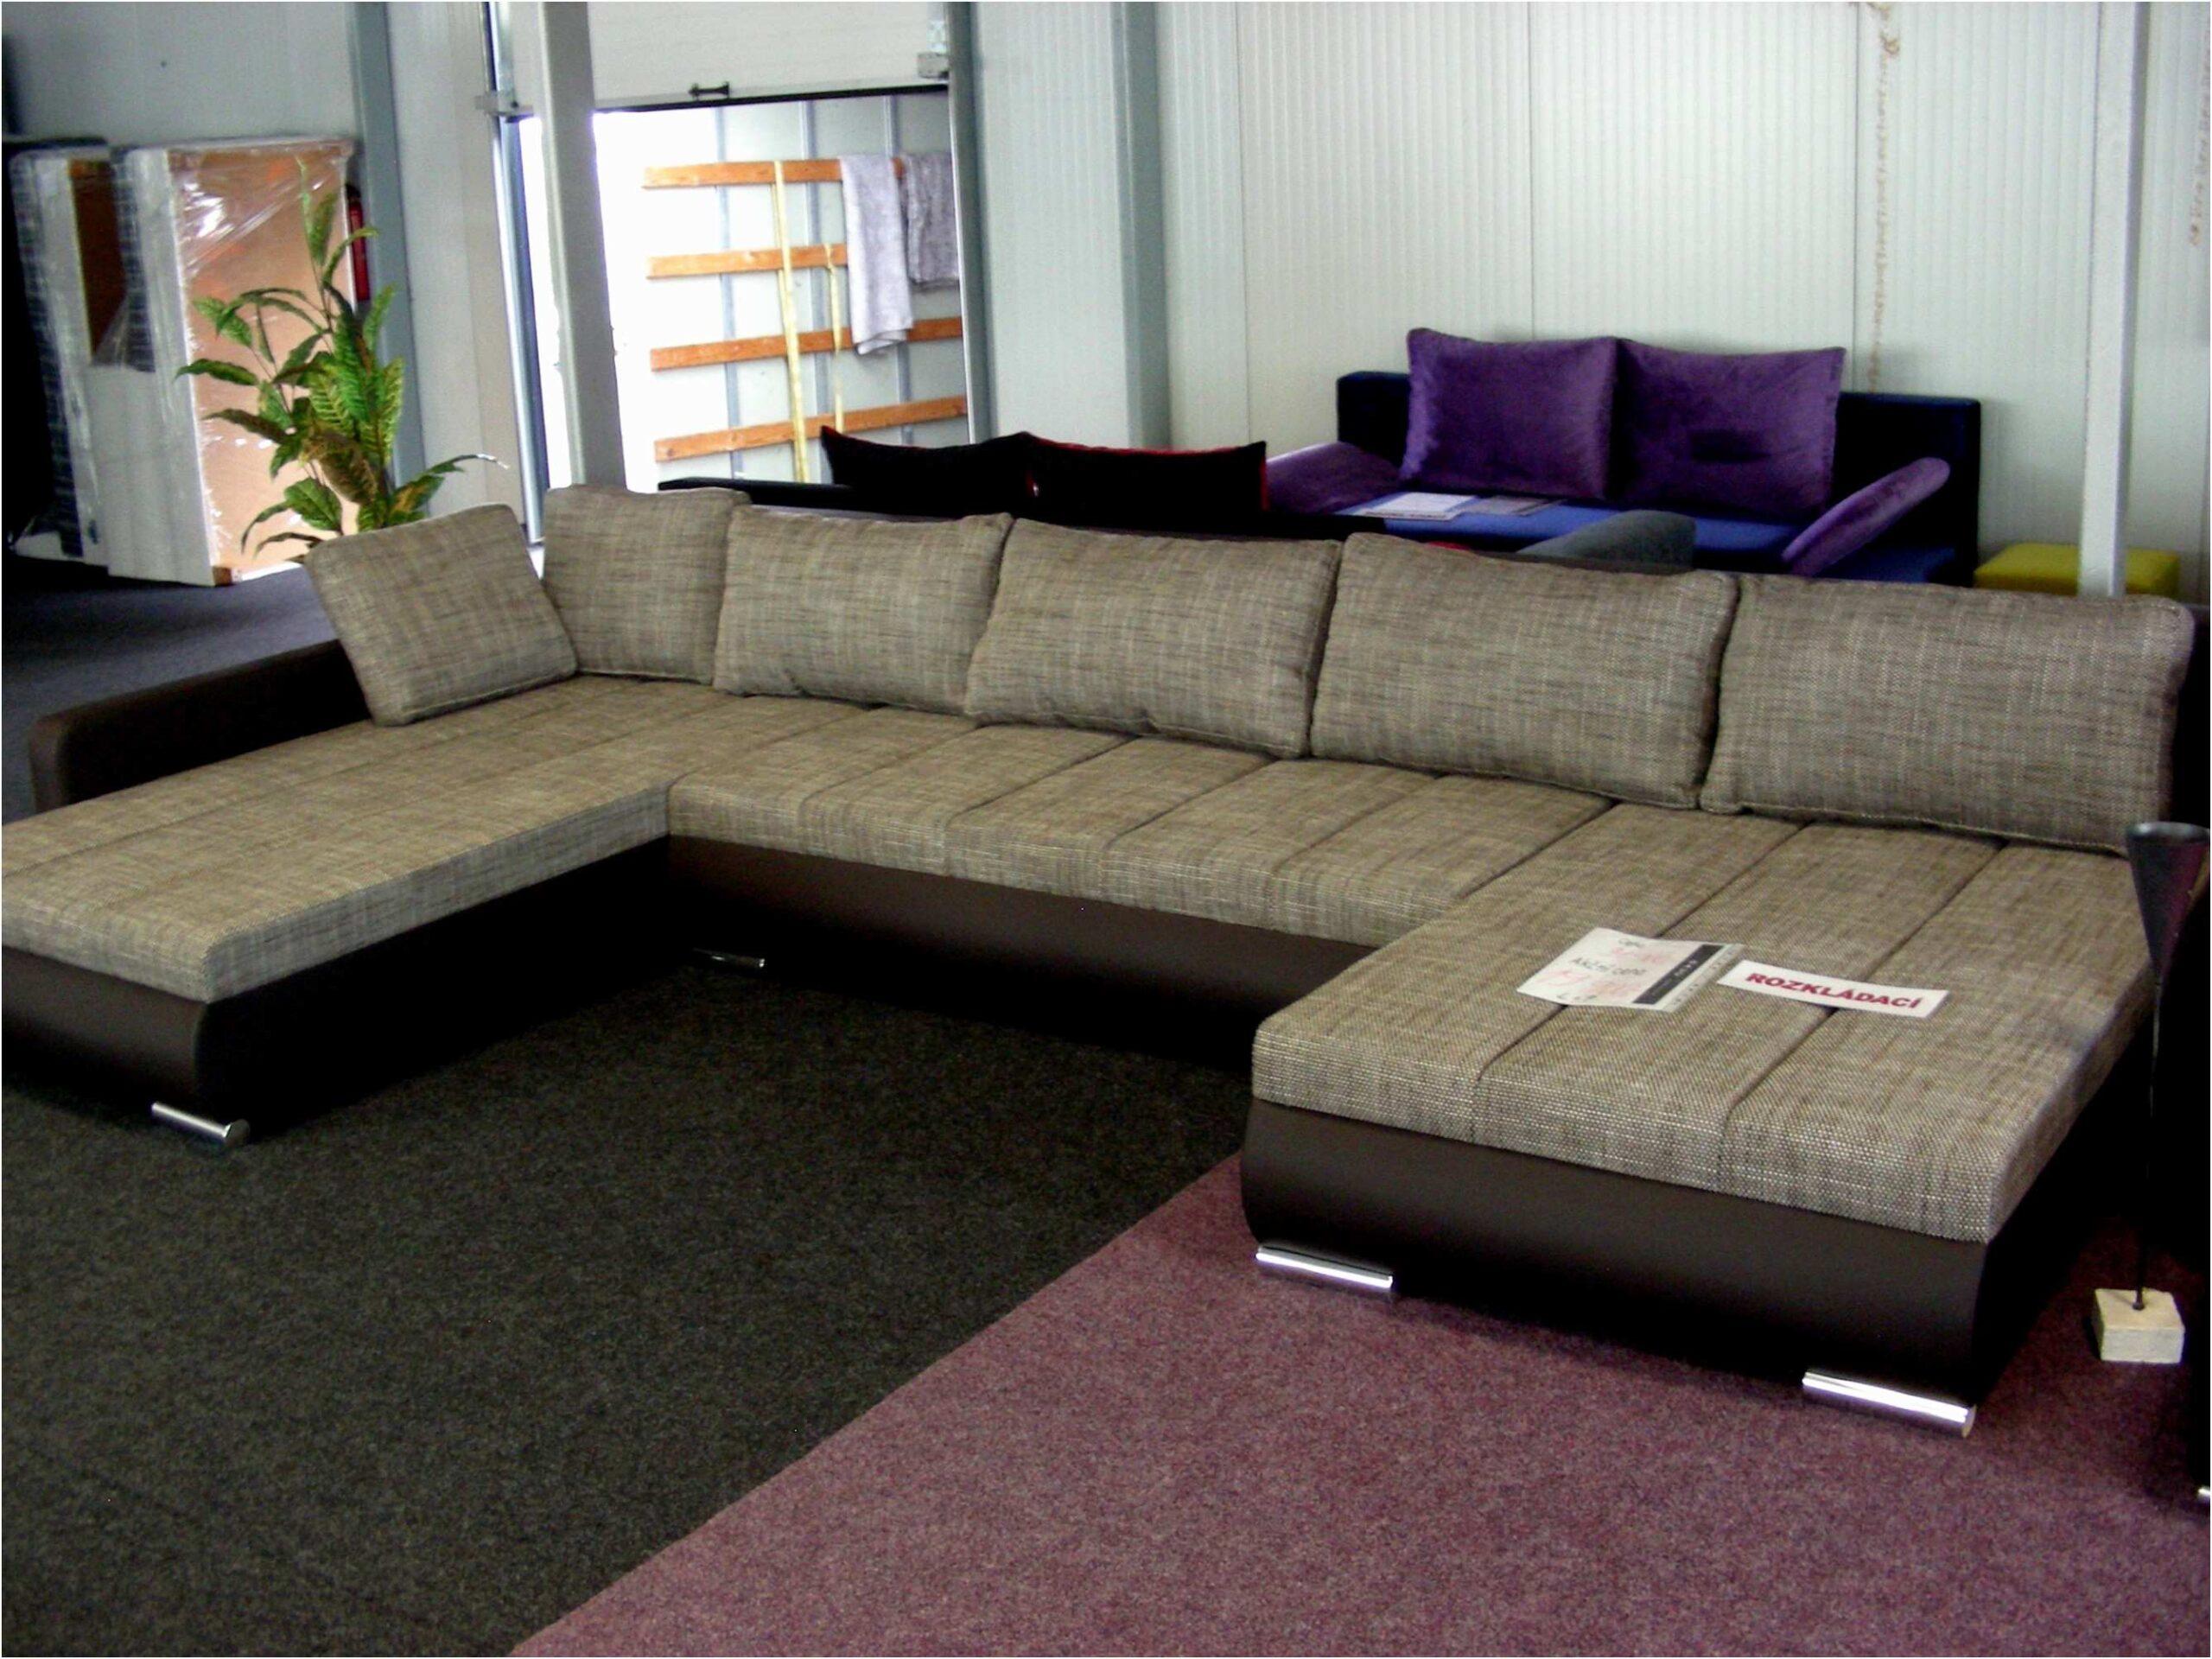 Full Size of Wohnzimmer Relaxliege Relaliege Elegant Rattan Couch Best Sofa Tapeten Ideen Sideboard Garten Gardinen Für Led Lampen Lampe Decken Beleuchtung Deckenlampen Wohnzimmer Wohnzimmer Relaxliege